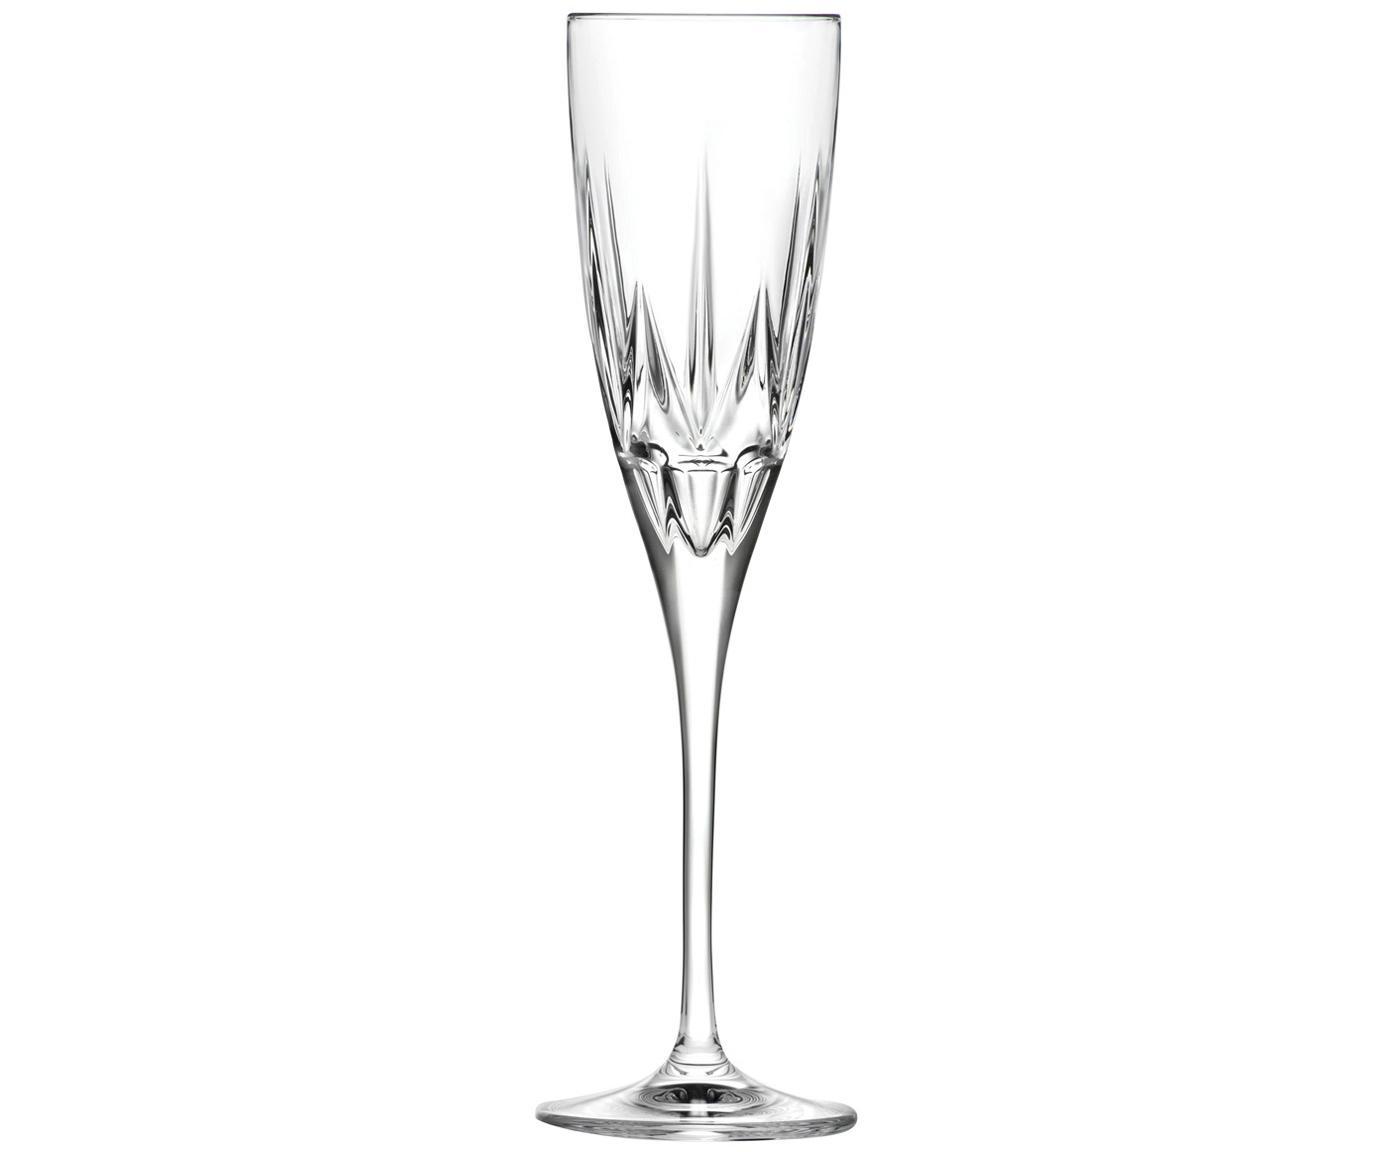 Kristall-Sektgläser Chic mit Relief, 6er-Set, Kristallglas, Transparent, Ø 6 x 24 cm